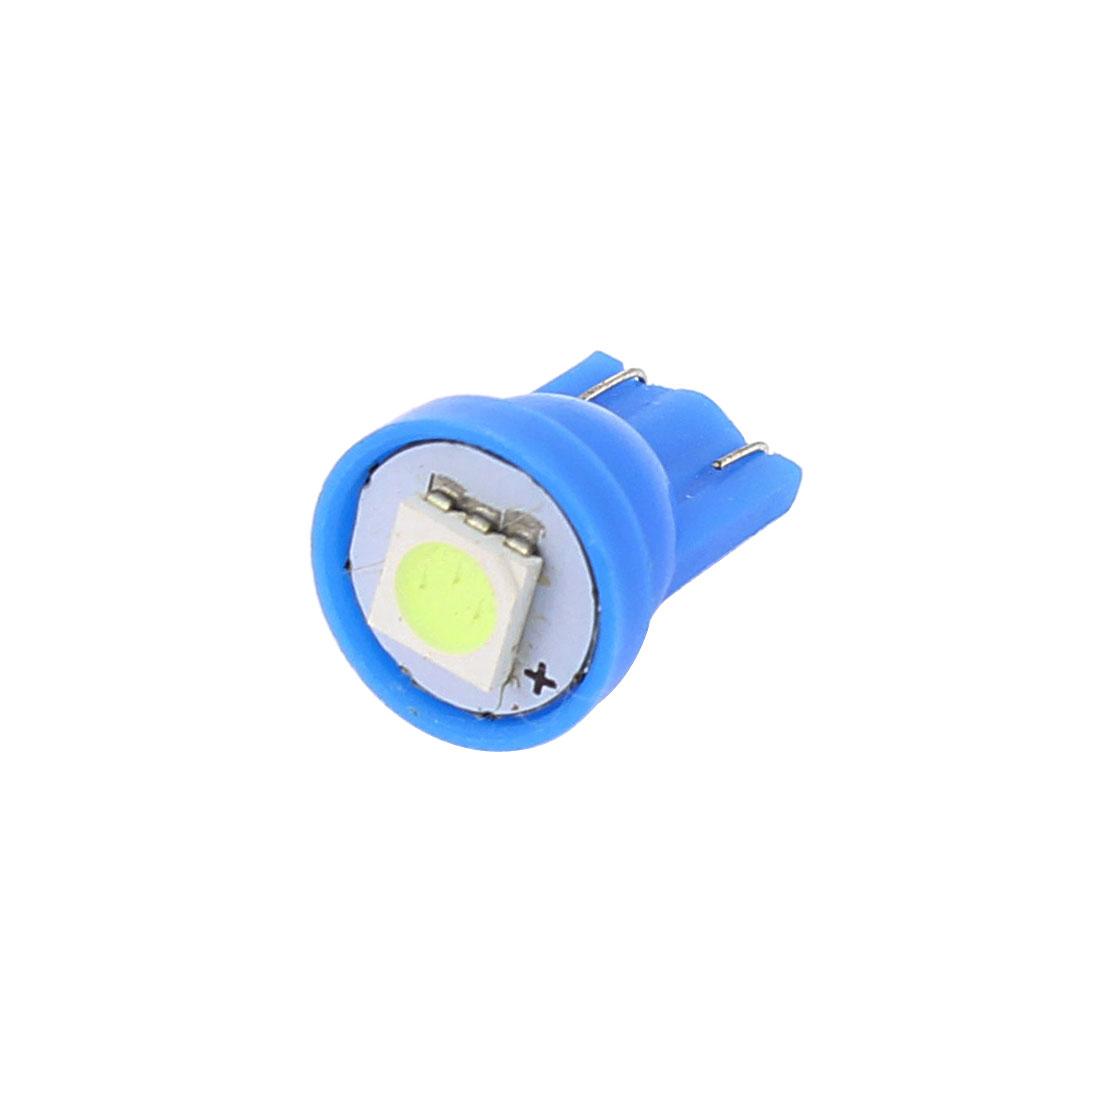 Blue T10 5050 SMD 1 LED 194 168 147 W5W 2652 2921 2825 Car Light Lamp Bulb Interior